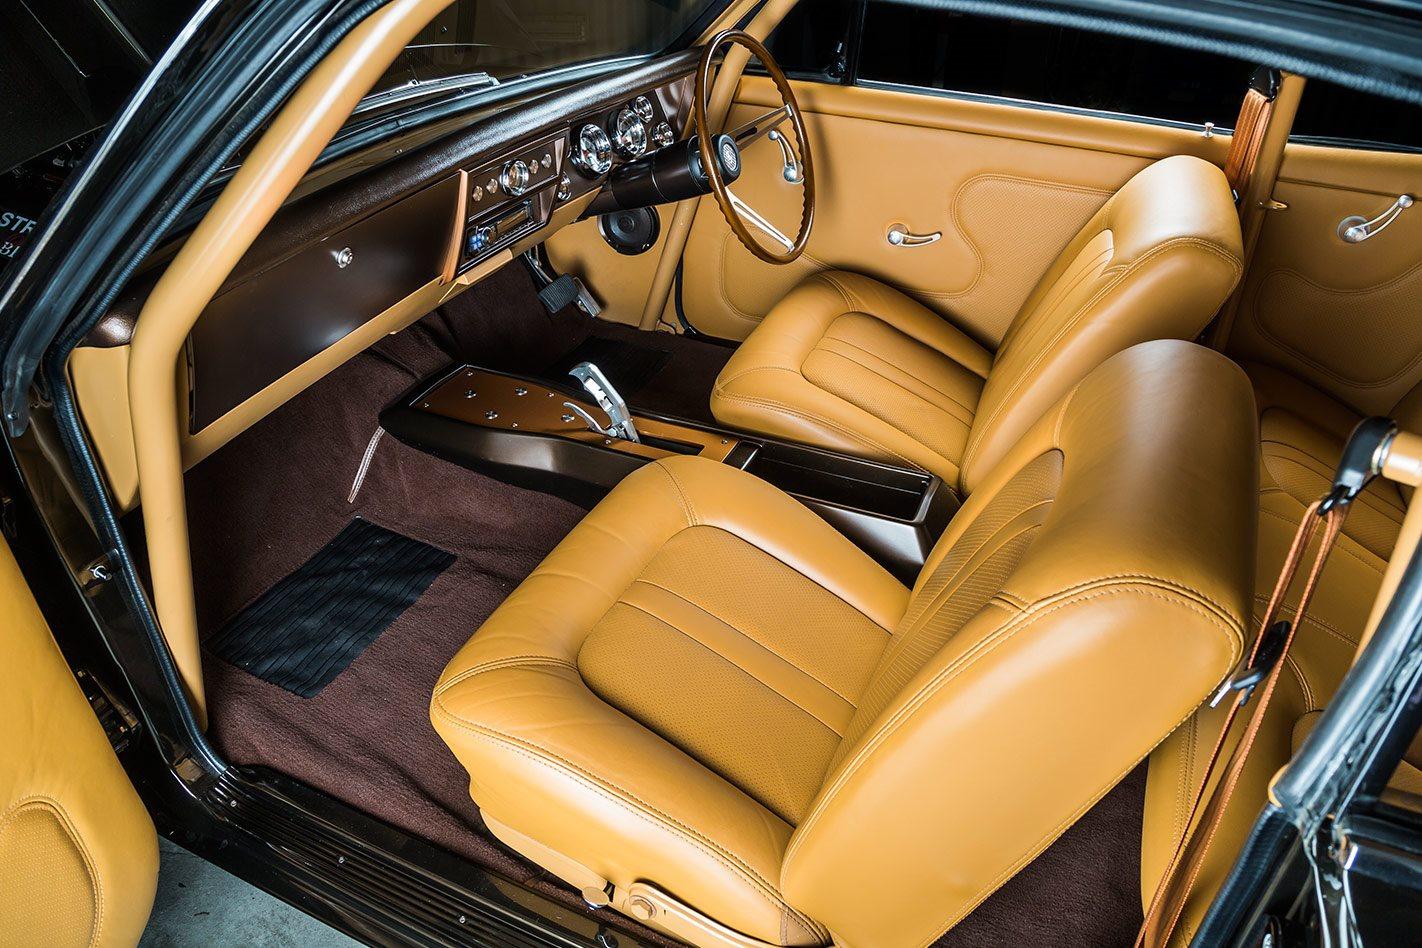 Holden HK Monaro interior front